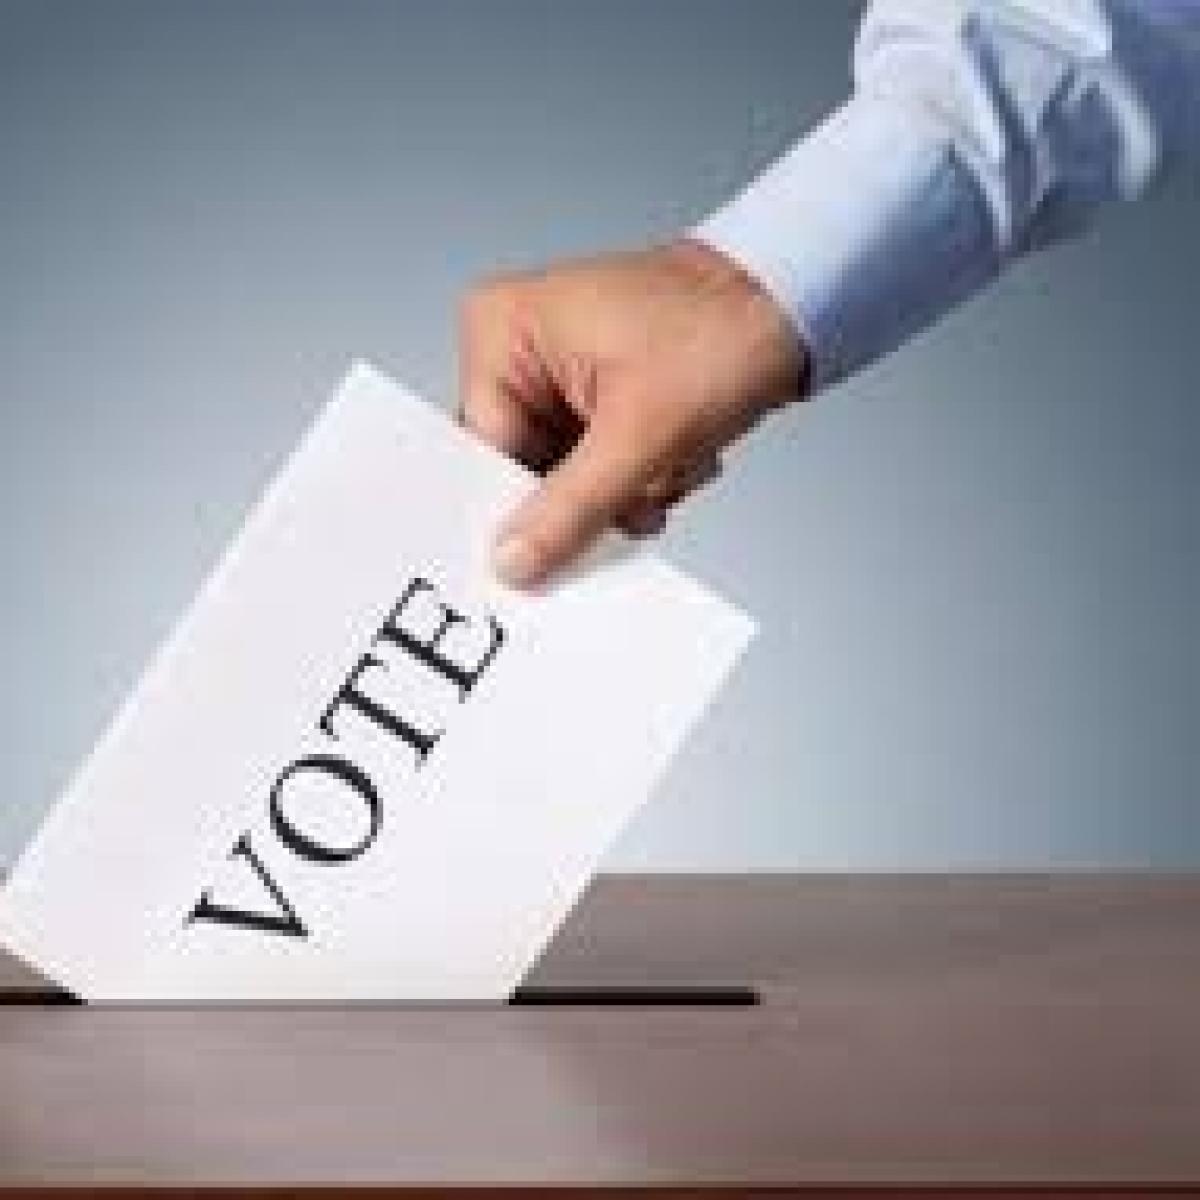 Bhopal: 'Unverified' 40000 advocates lose voting right